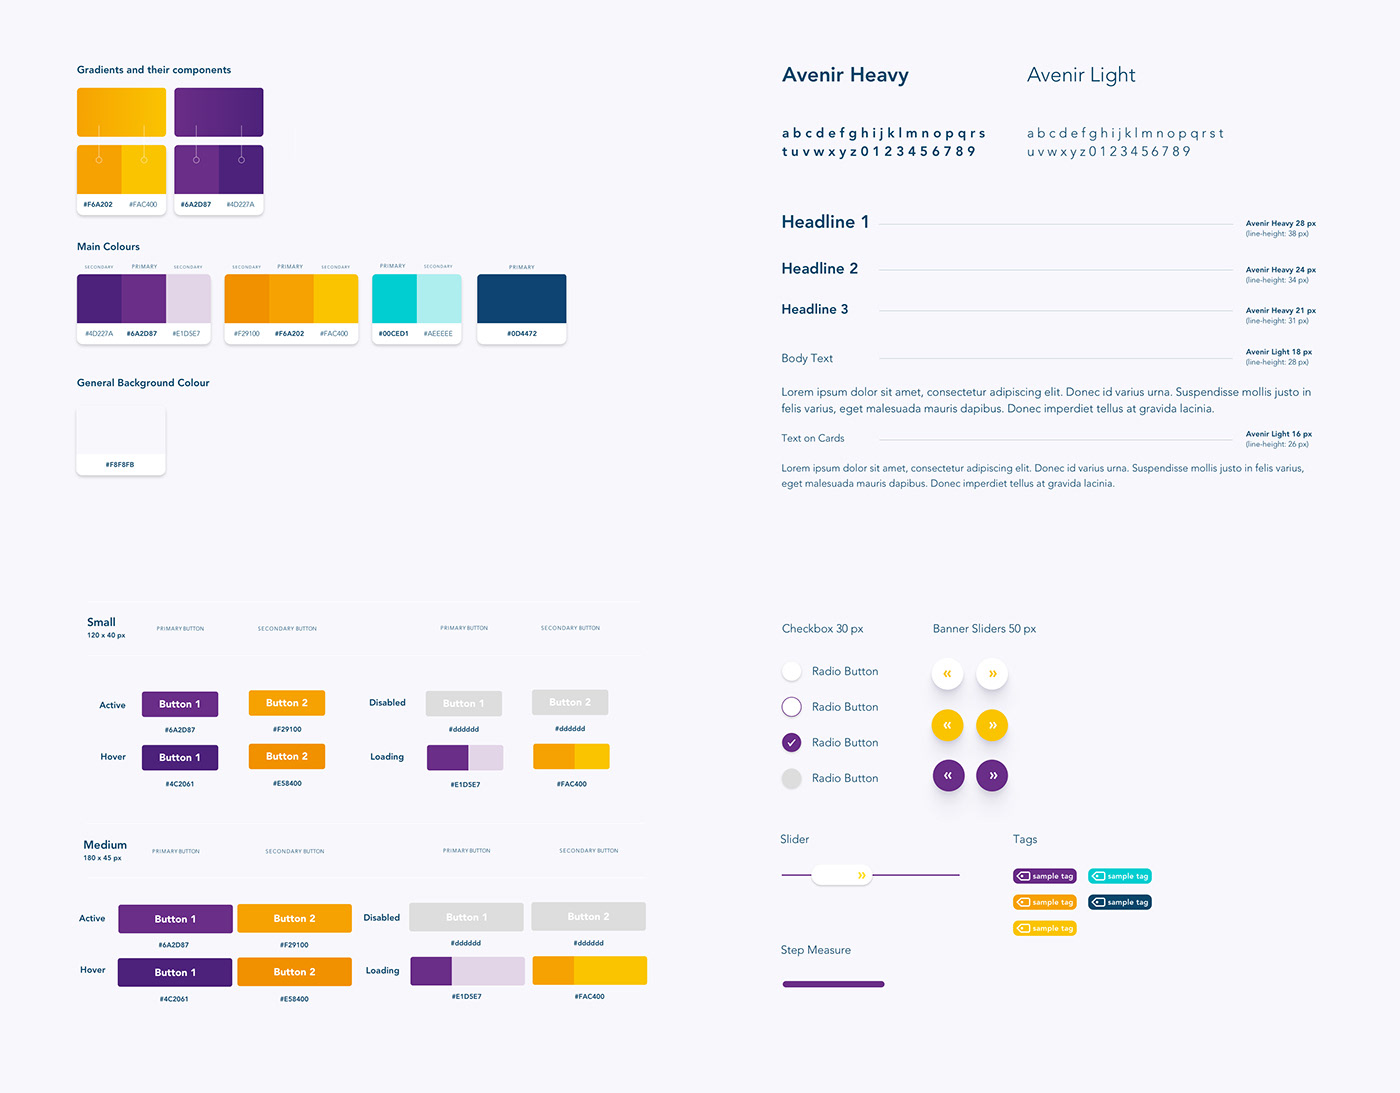 Sustainable Education rebranding redesign visual identitiy graphic design  branding  Swedish Scandinavian design